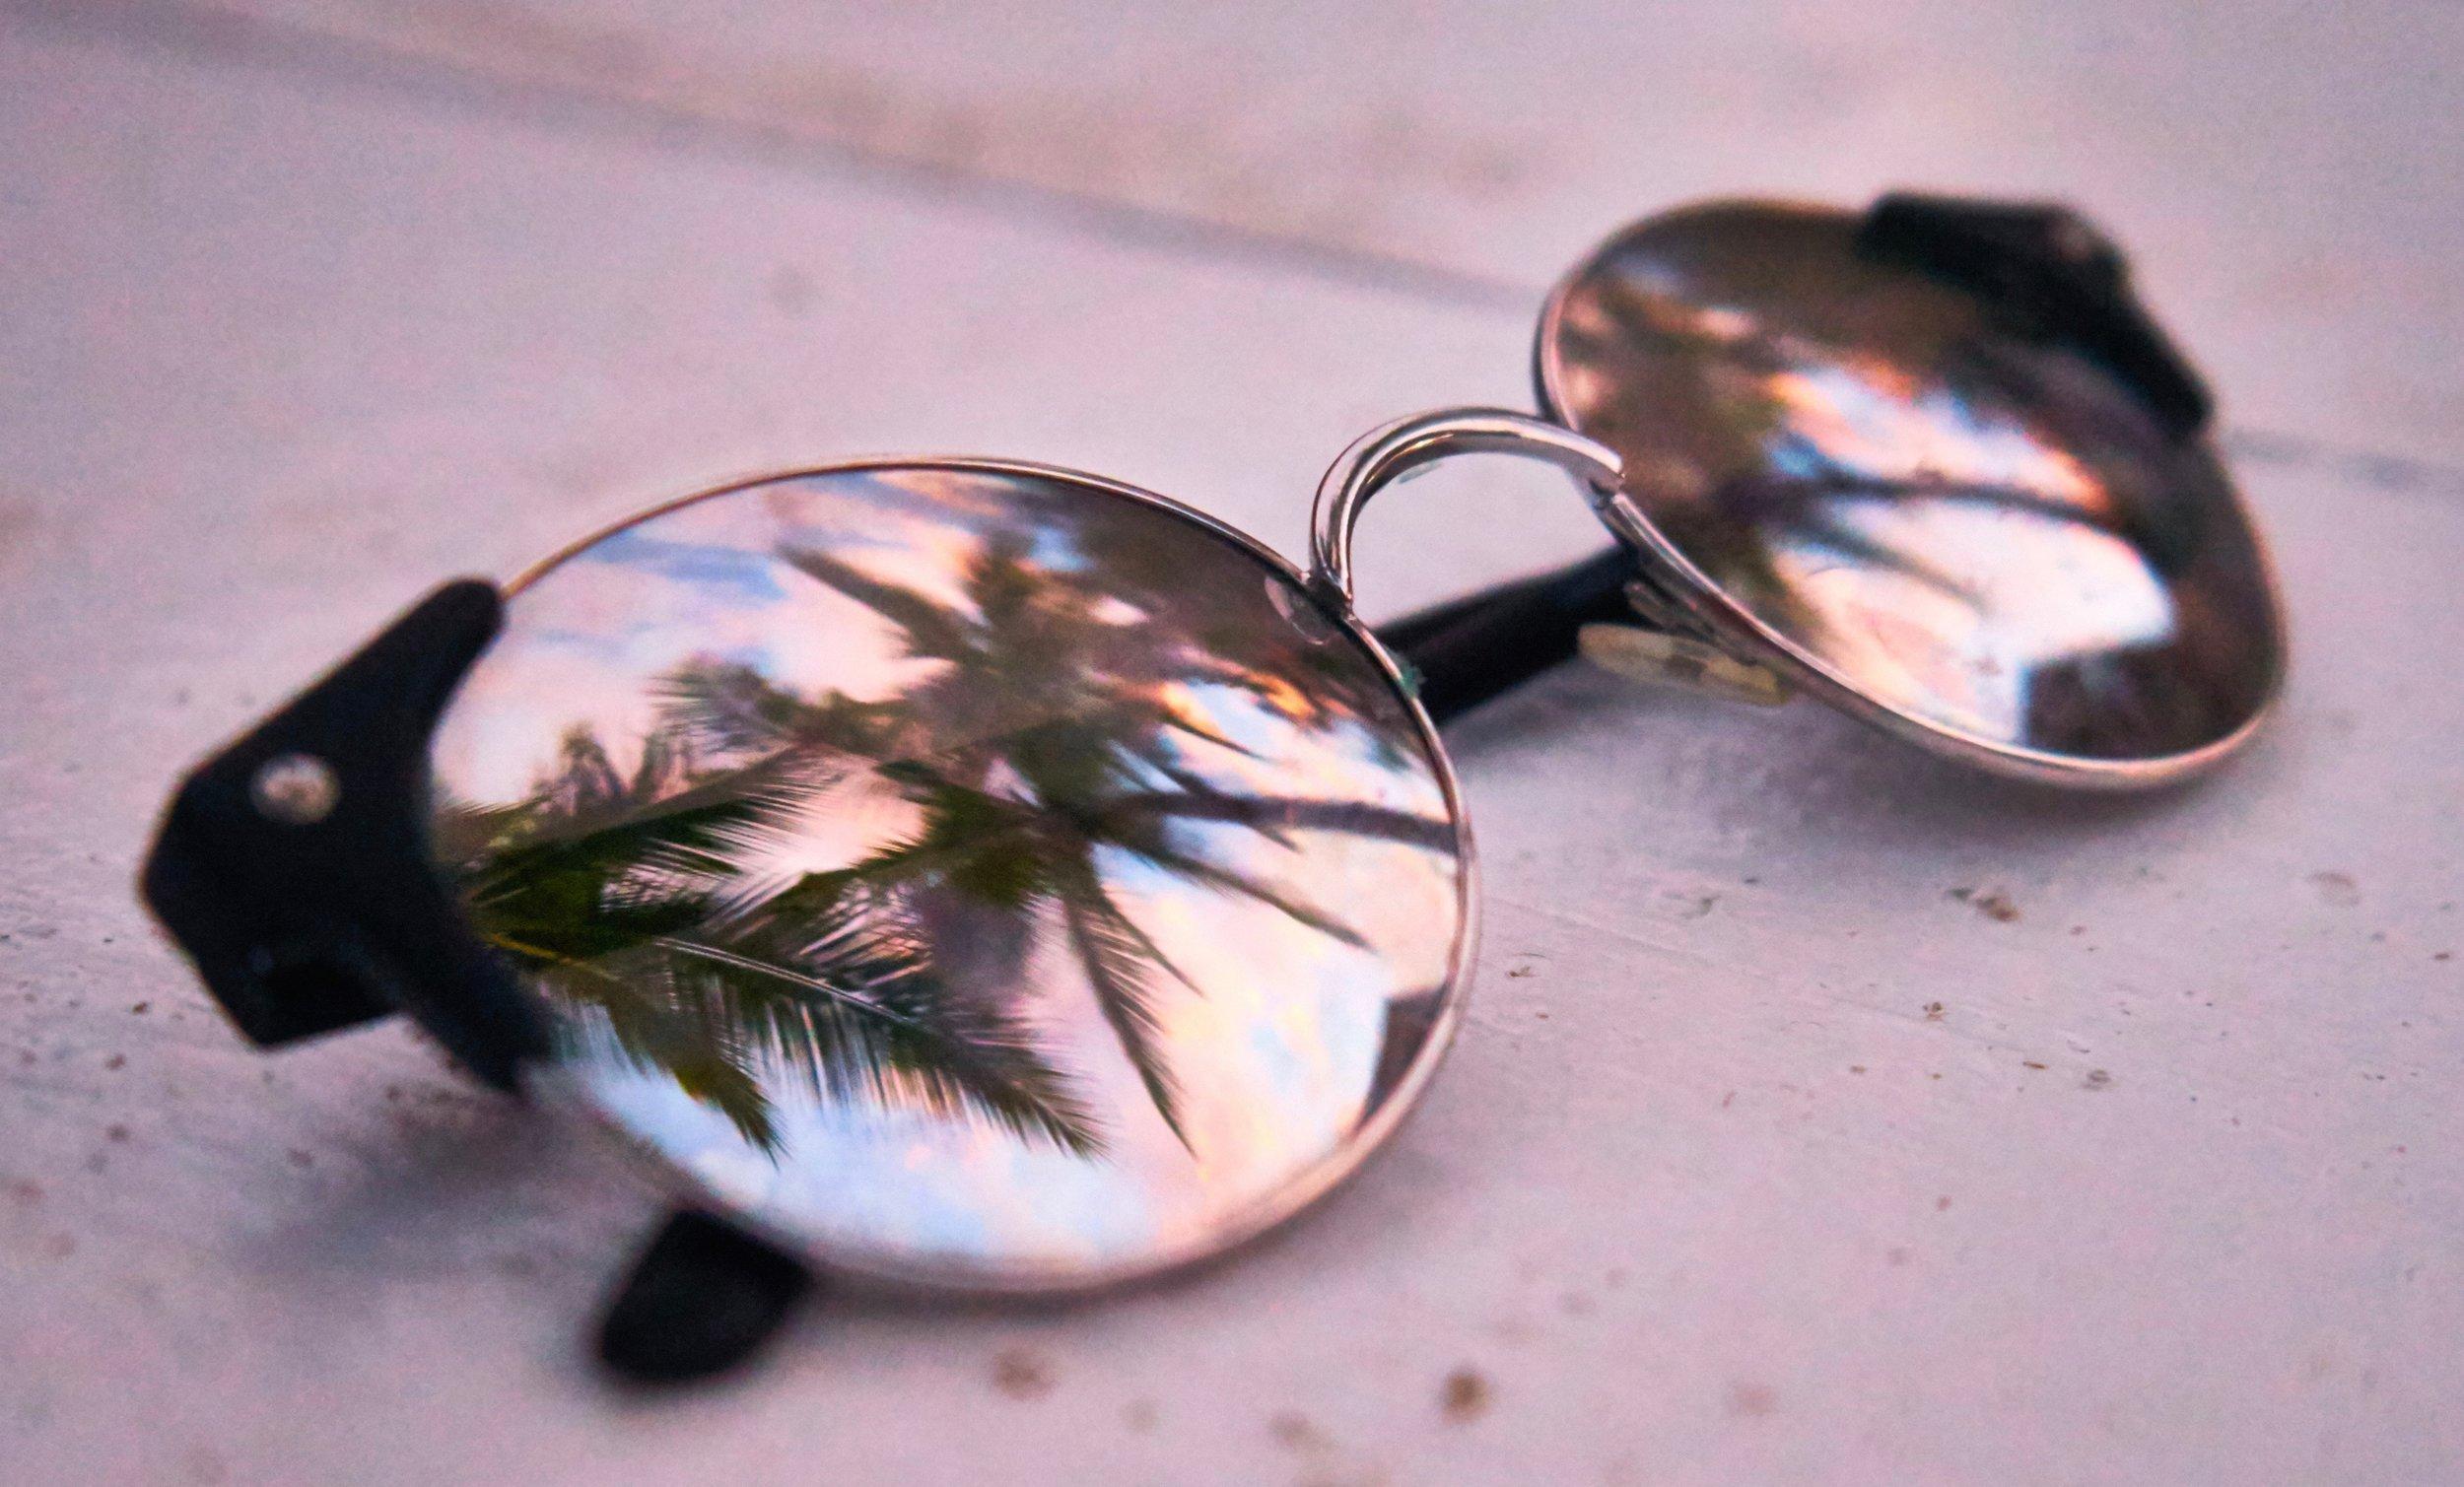 sunglasses_palmTree.jpg